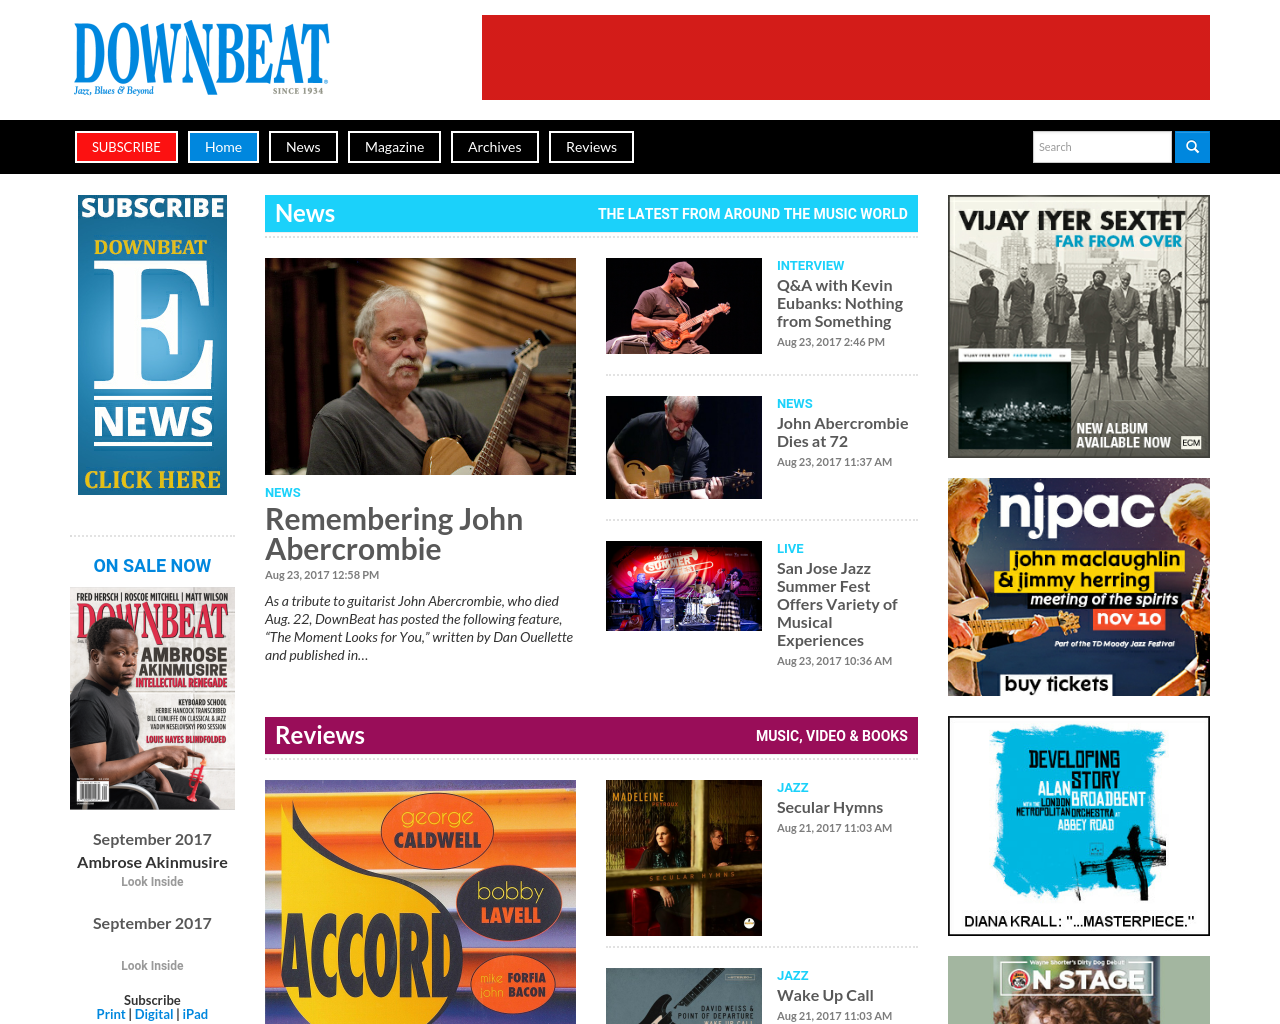 DownBeat-Magazine-Advertising-Reviews-Pricing